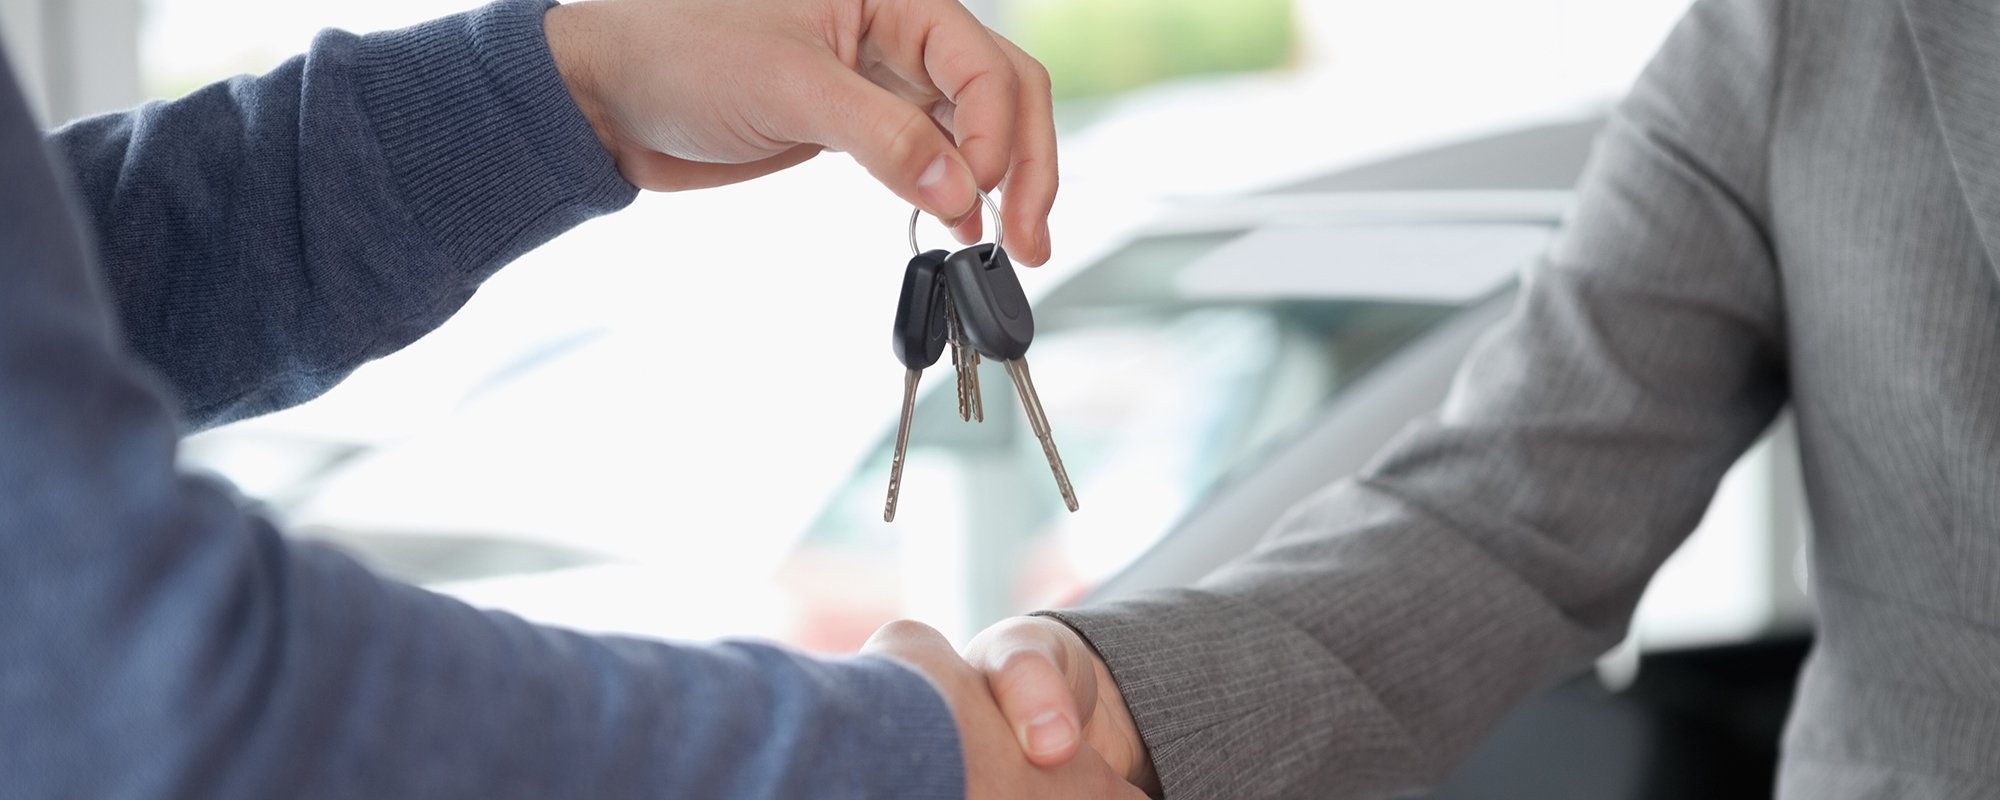 Individual handing over the car keys